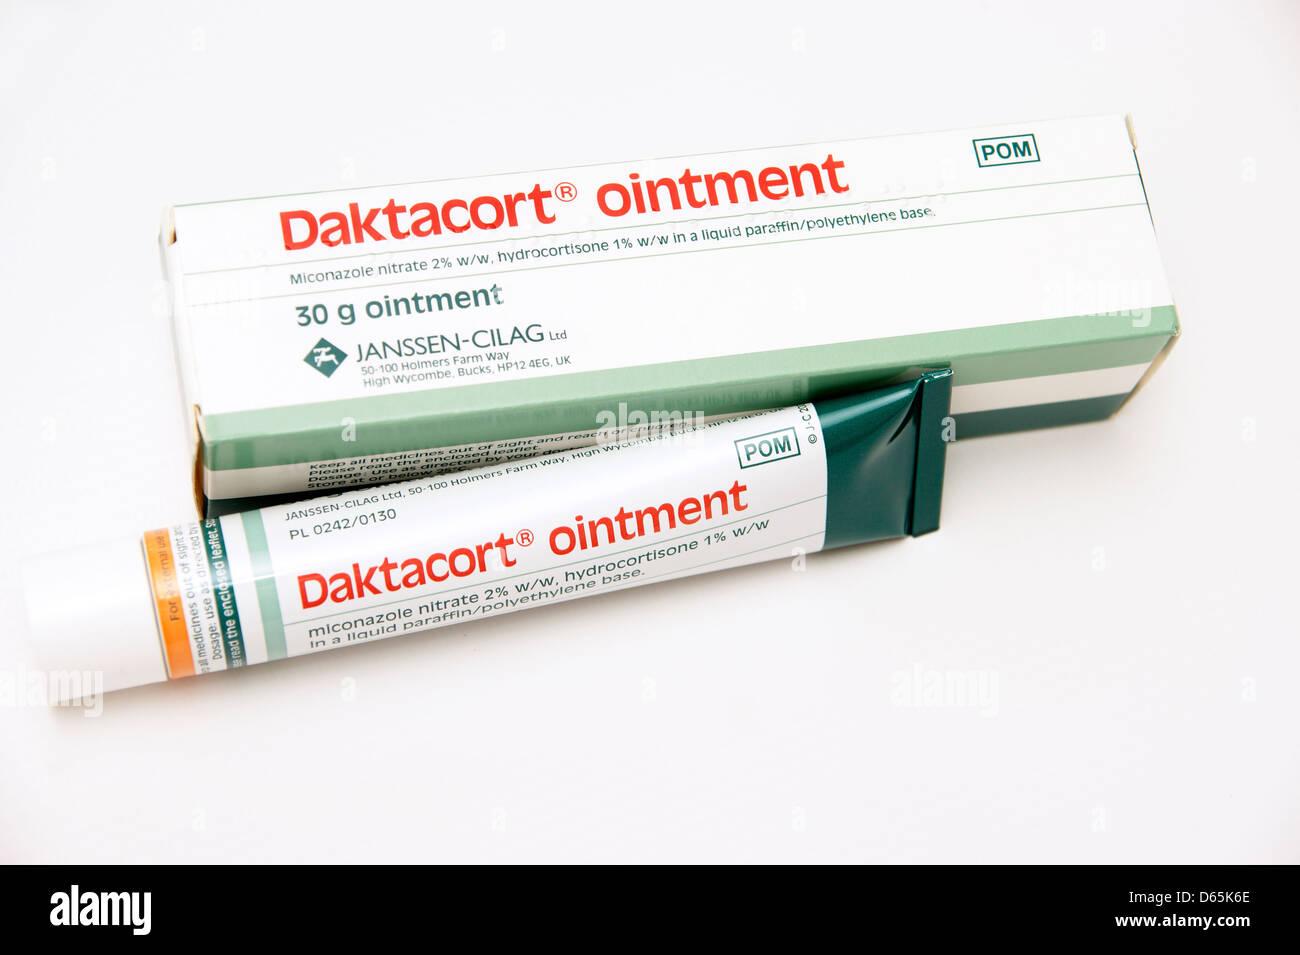 steroid cream for eczema uk